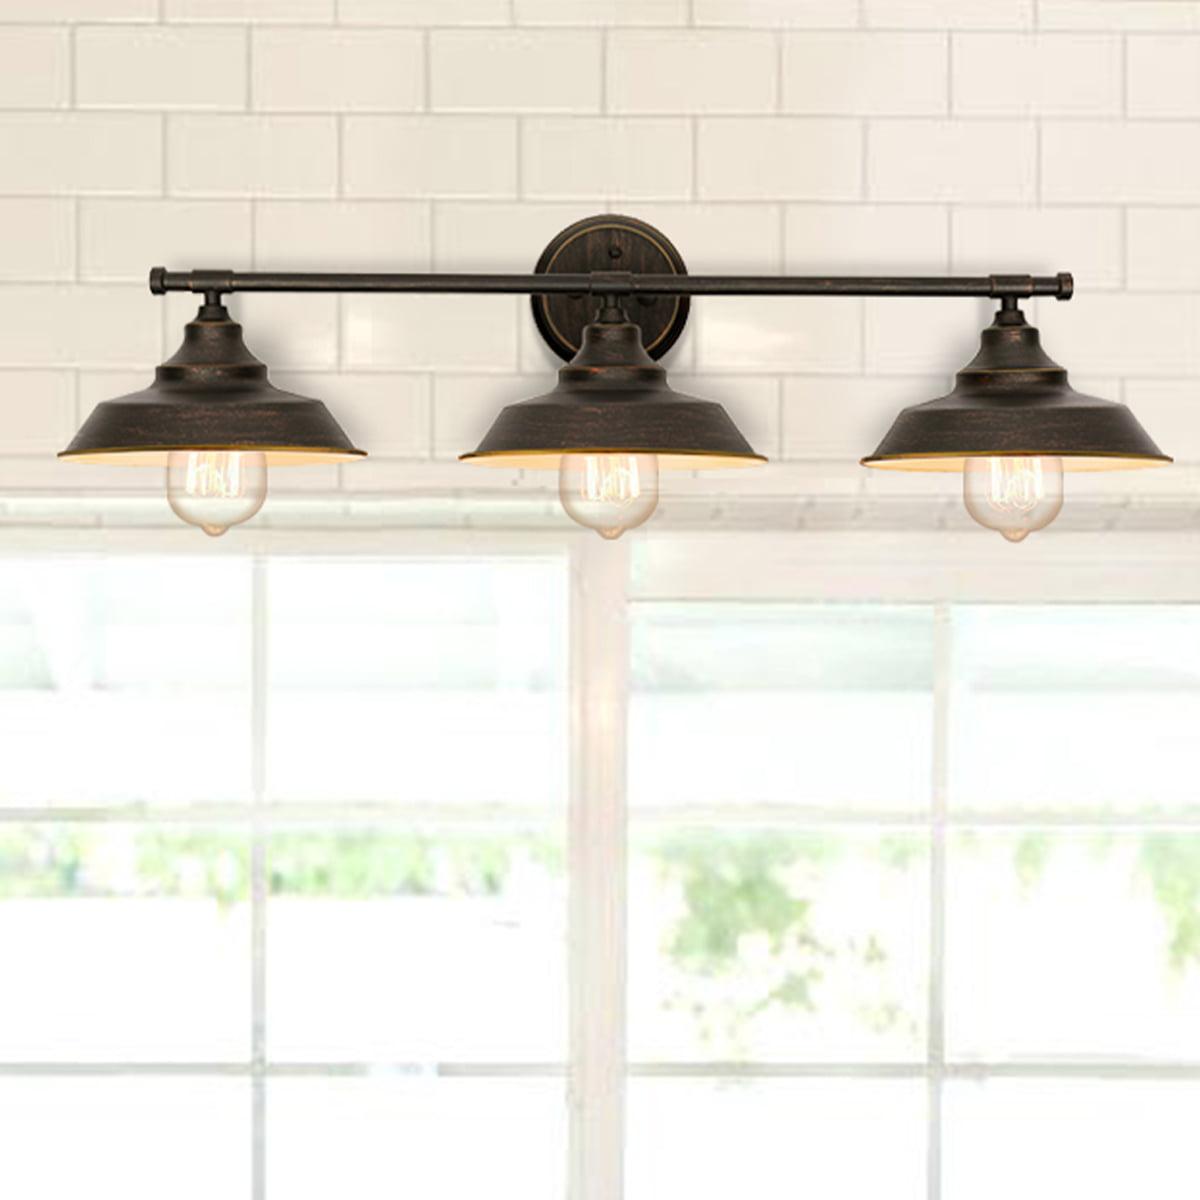 Lamps Lighting Ceiling Fans 2 3 Light Industrial Vanity Light Fixture Bathroom Metal Wall Lamp Wall Sconce Podh Com Br